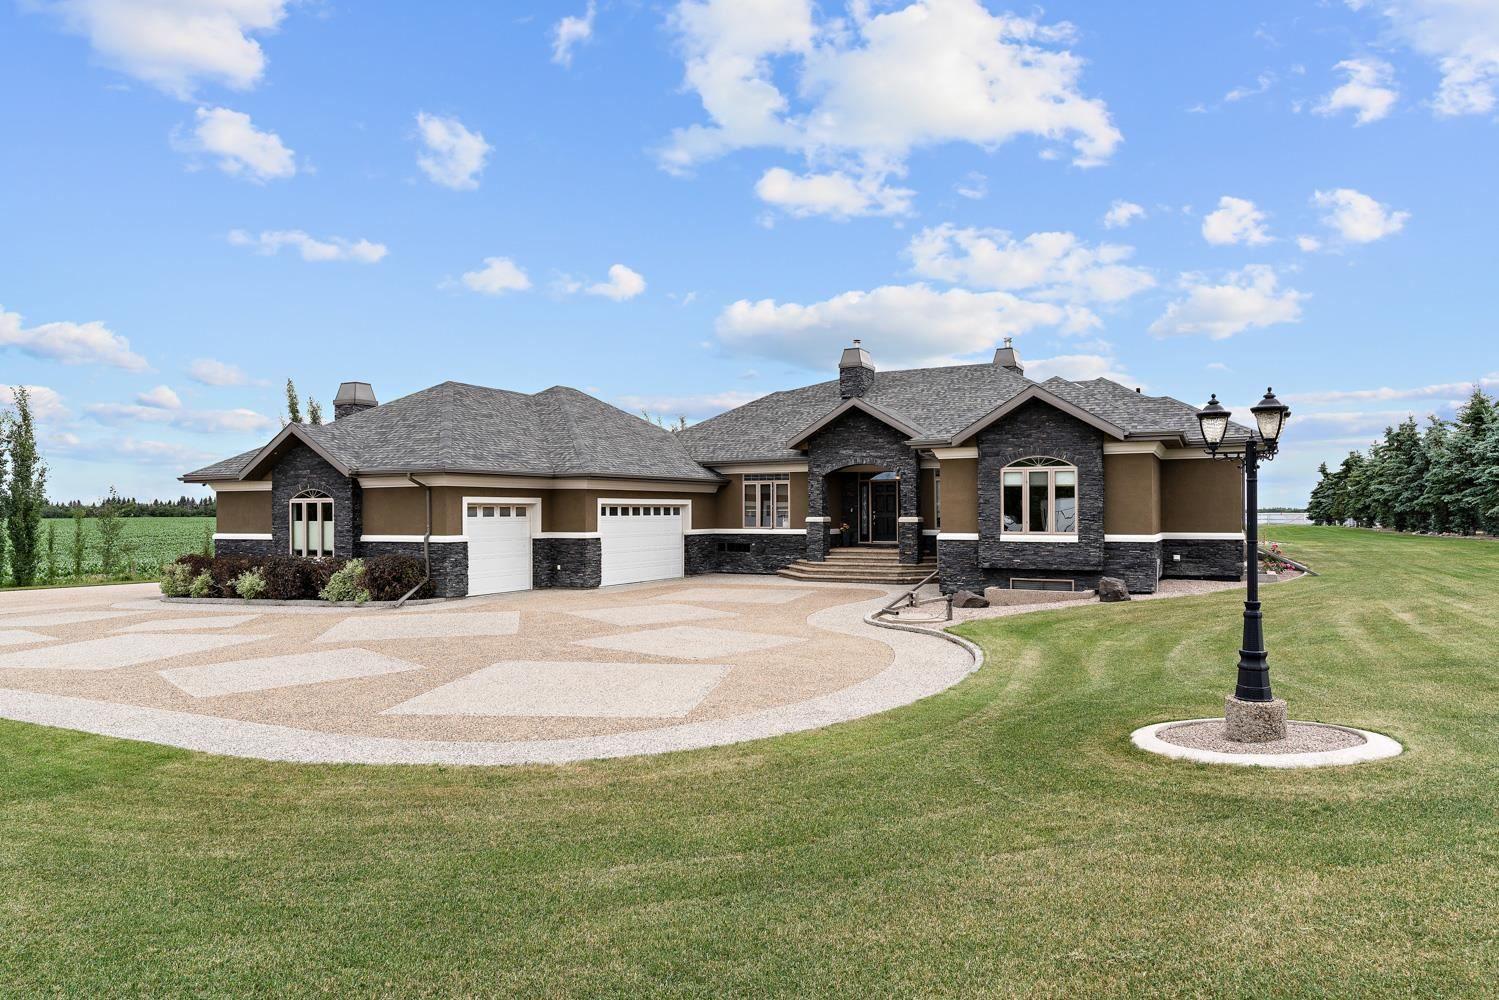 Main Photo: 98 CROZIER Drive: Rural Sturgeon County House for sale : MLS®# E4253581